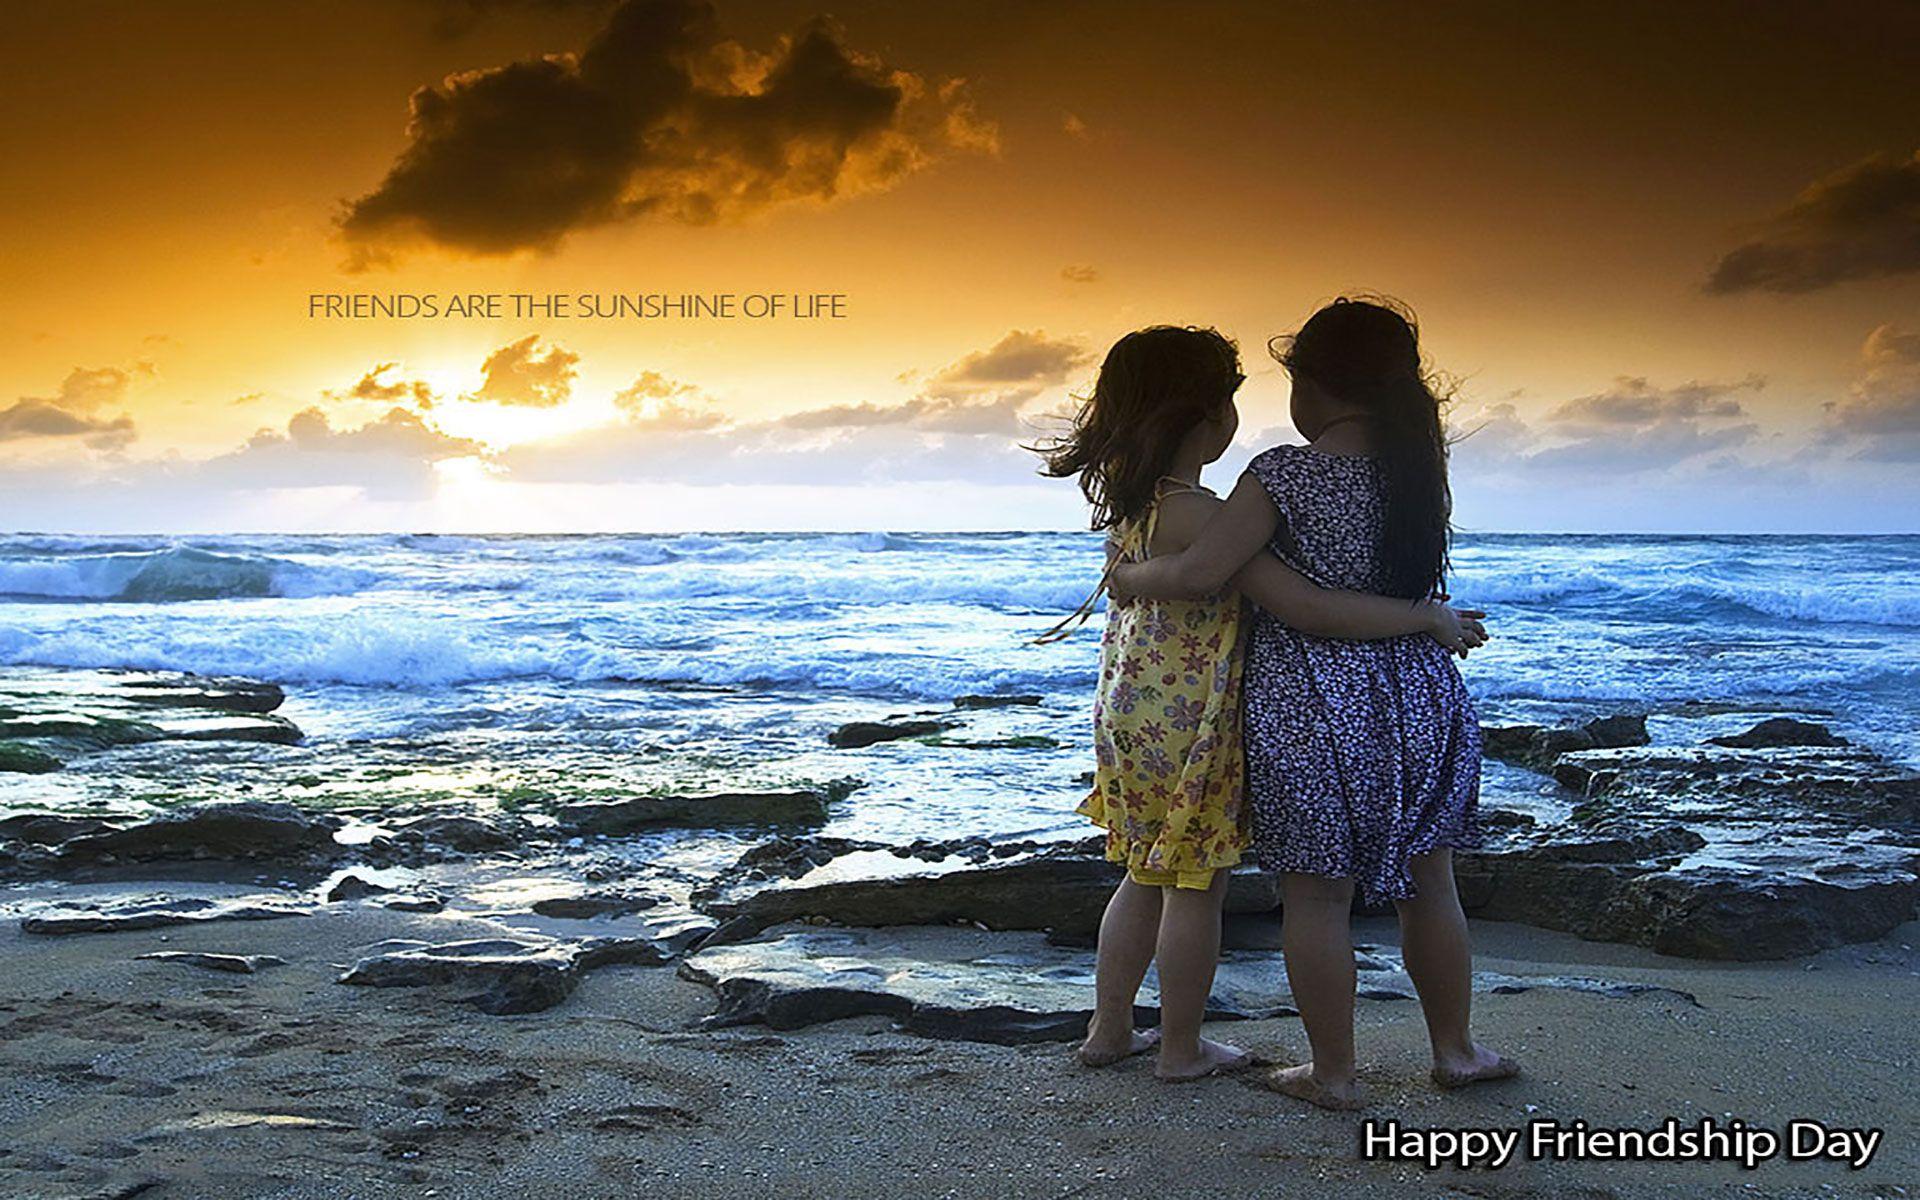 Wallpaper download of friendship - Beautiful Images Of Friendship Free Download